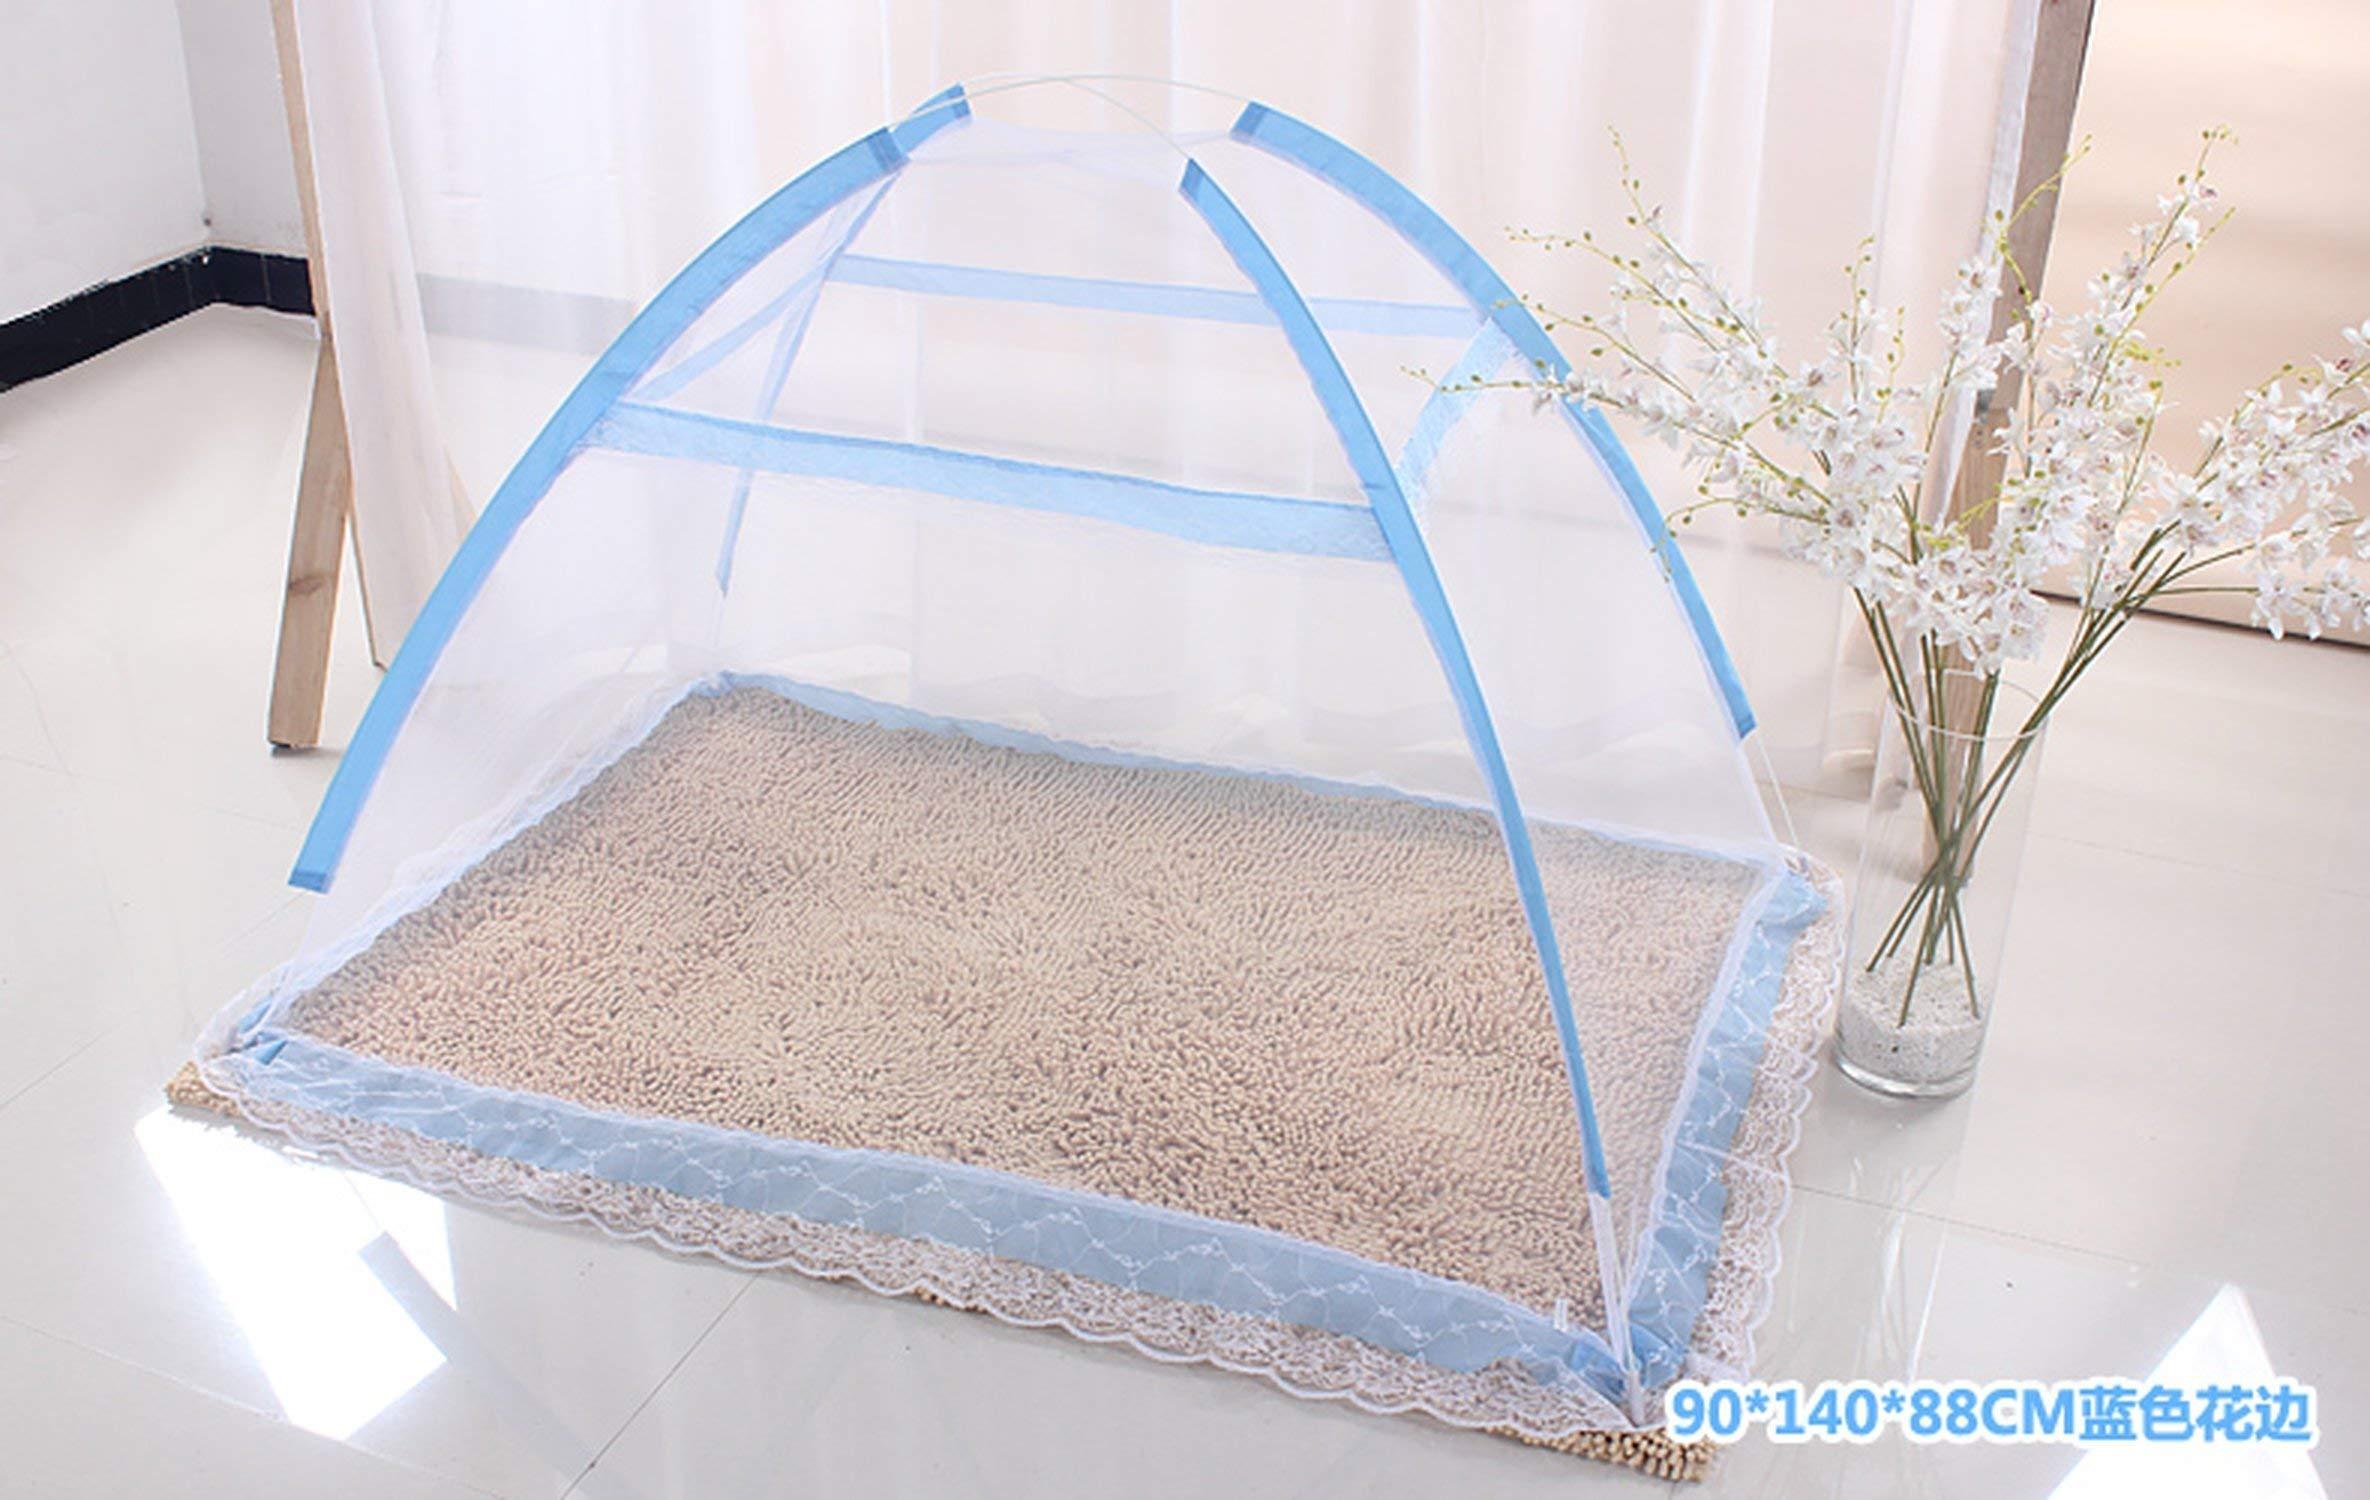 From Zero mosquito net for Children 90X140Cm Folding Baby Mosquito Net Mongolian Portable Outdoor Travel Mosquito Net,Sky Blue,90X140Cm by From Zero mosquito net (Image #3)